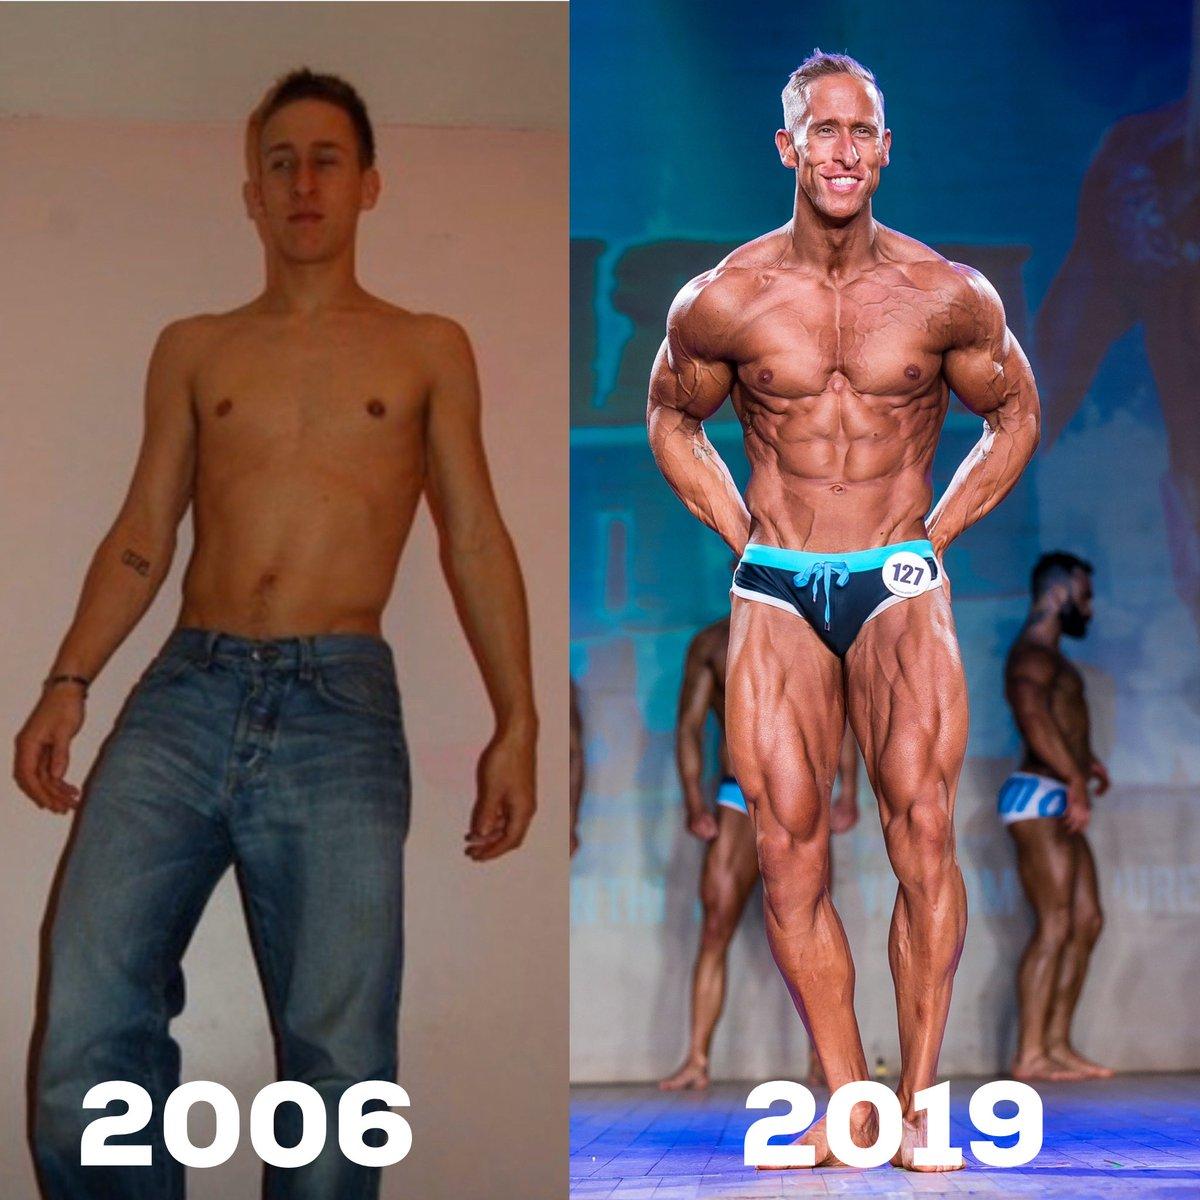 #TransformationTuesday  don't rush it folks  <br>http://pic.twitter.com/VGcpmBVmiX